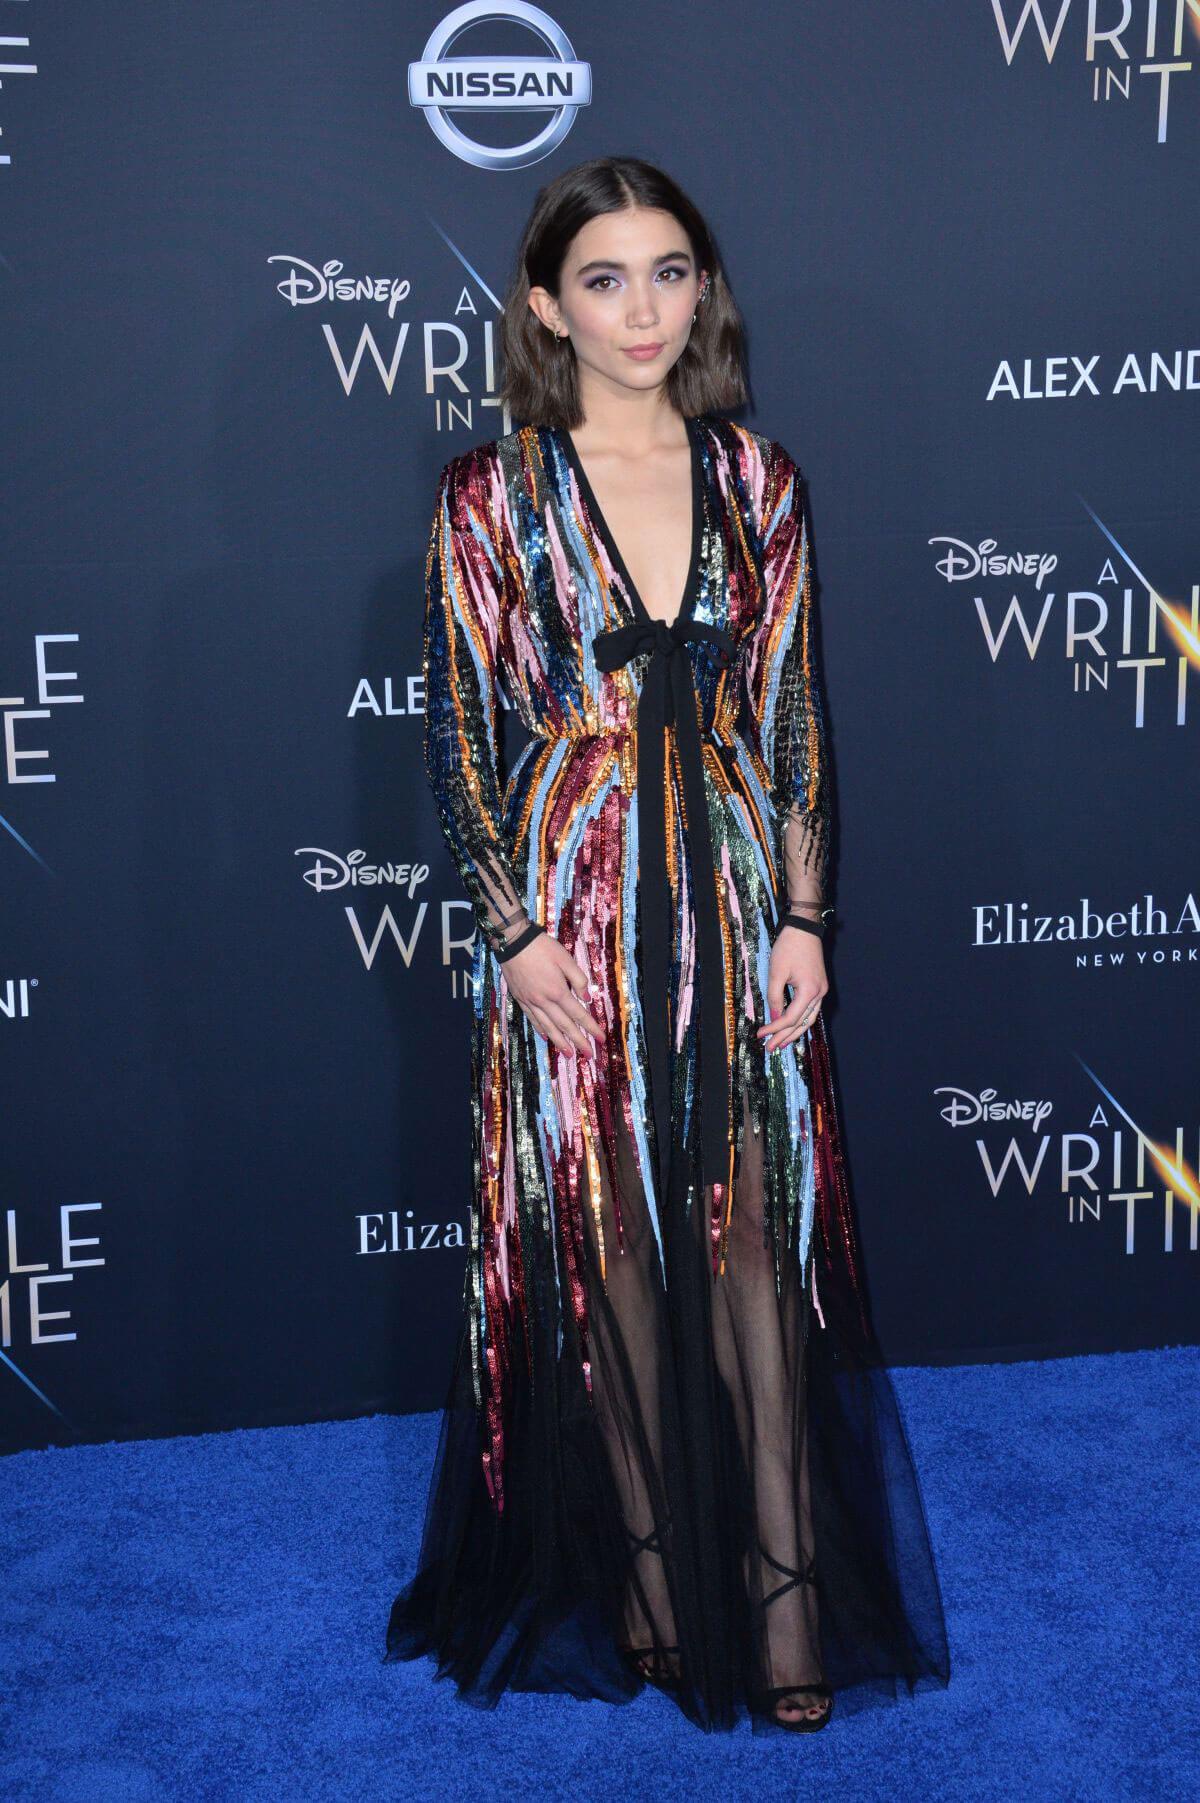 Rowan Blanchard Stills at A Wrinkle in Time Premiere in 1200x1803